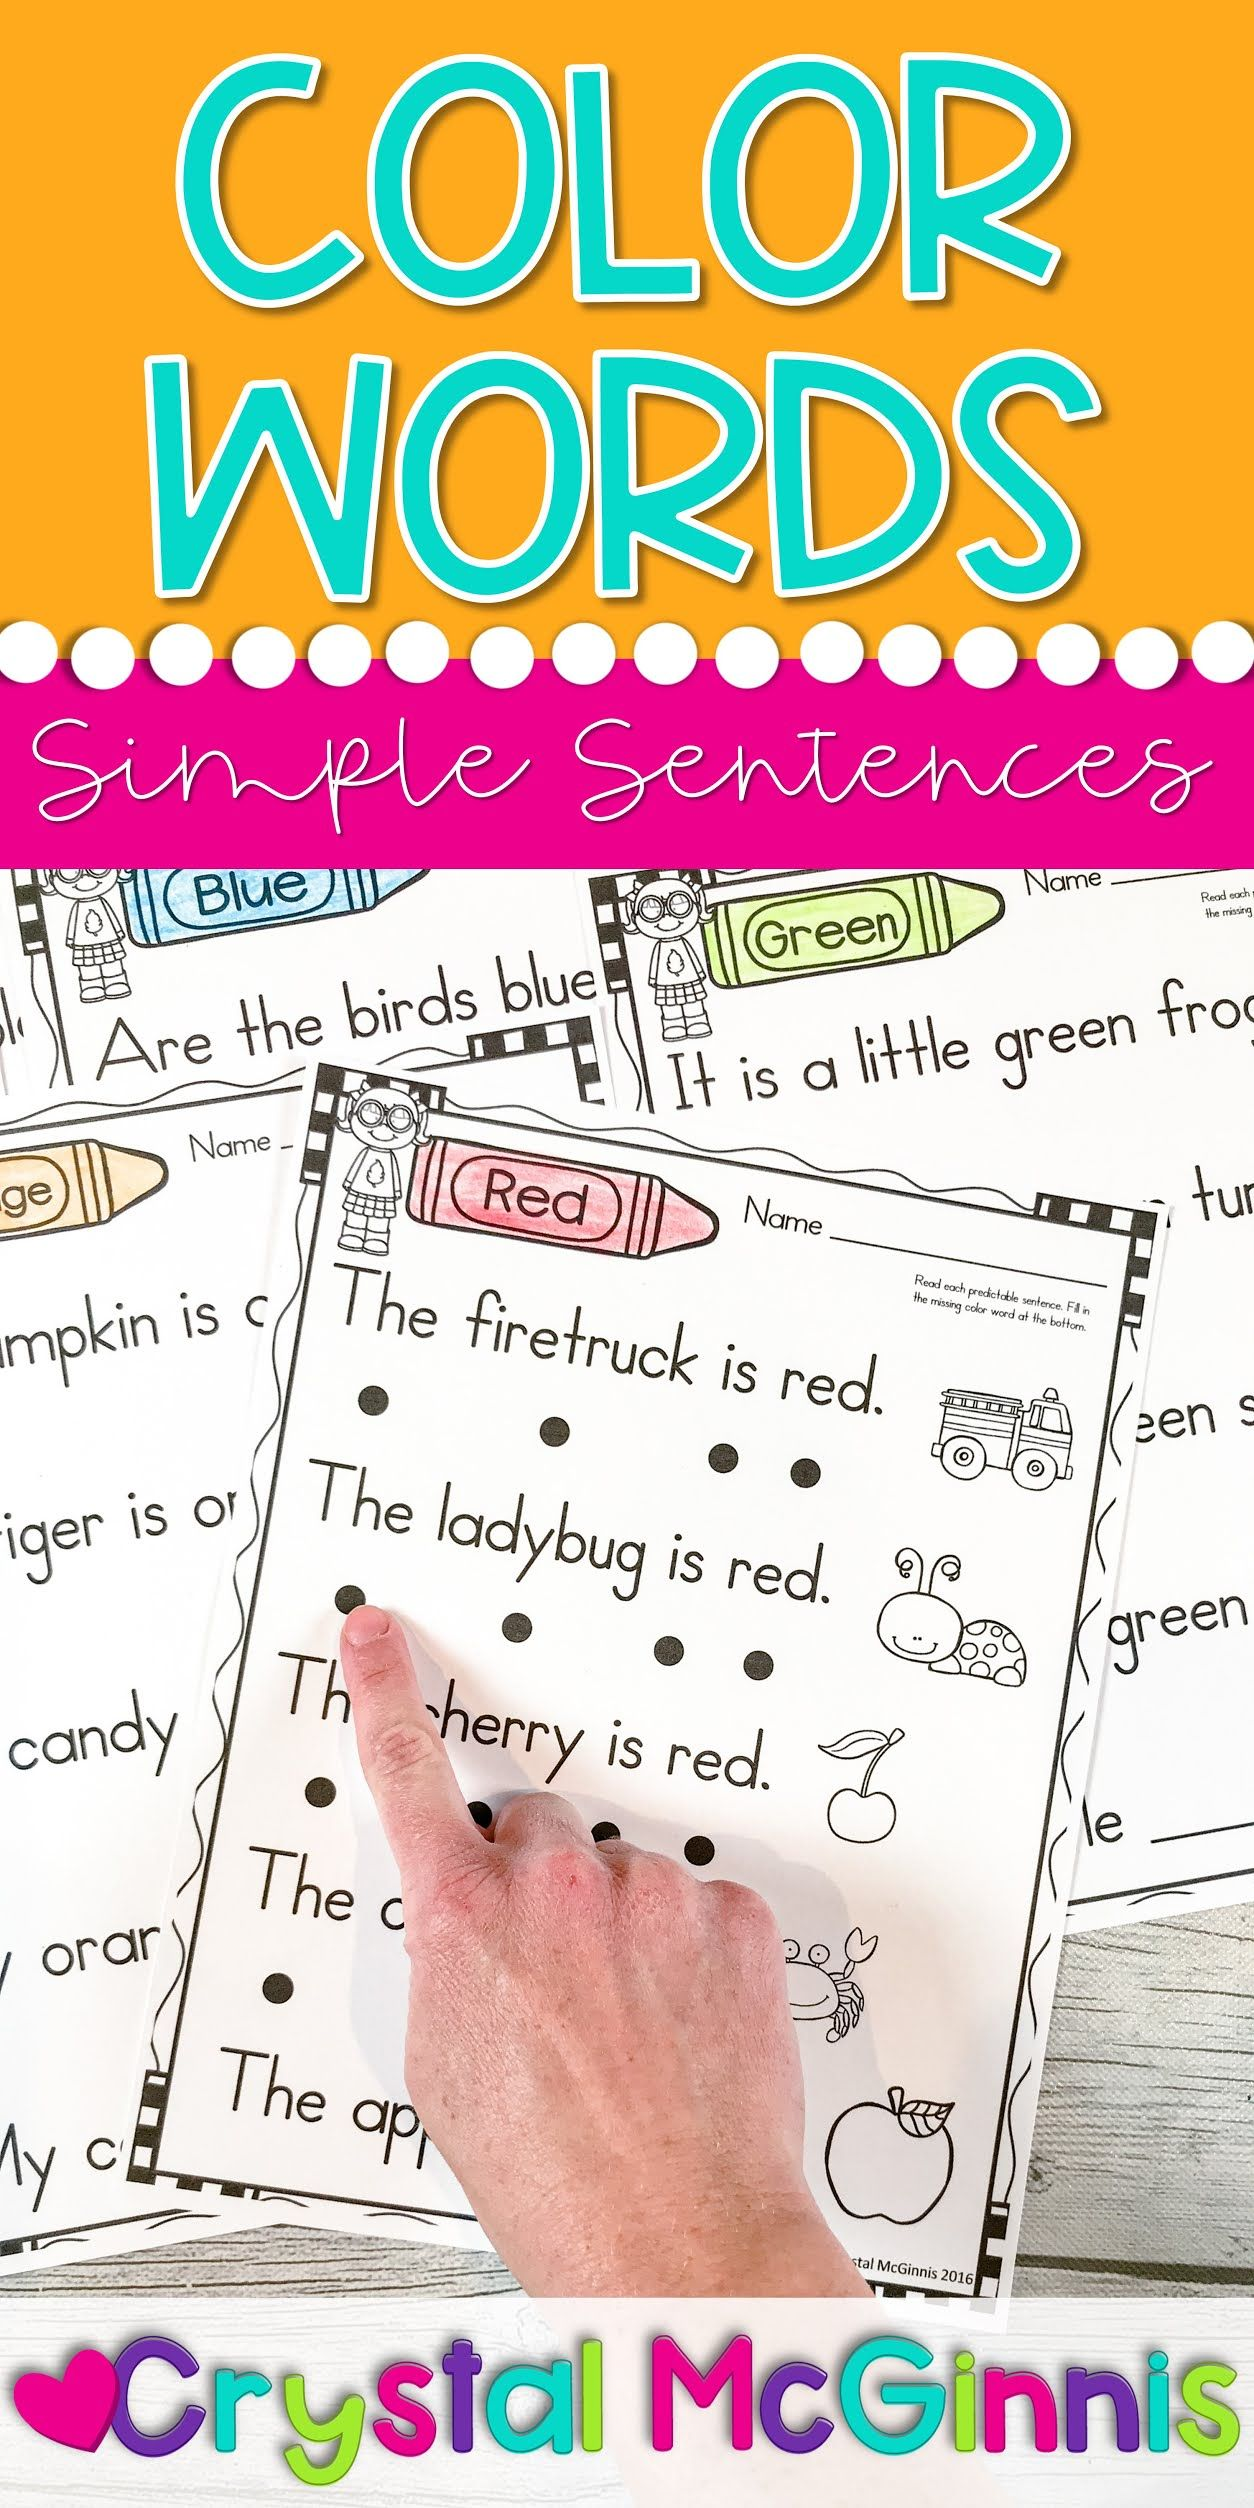 Color Words Simple Sentences Reading Practice For New Readers Mrs Mcginnis Little Zizzers Teaching Spelling Dyslexia Activities Reading Practice [ 2508 x 1254 Pixel ]